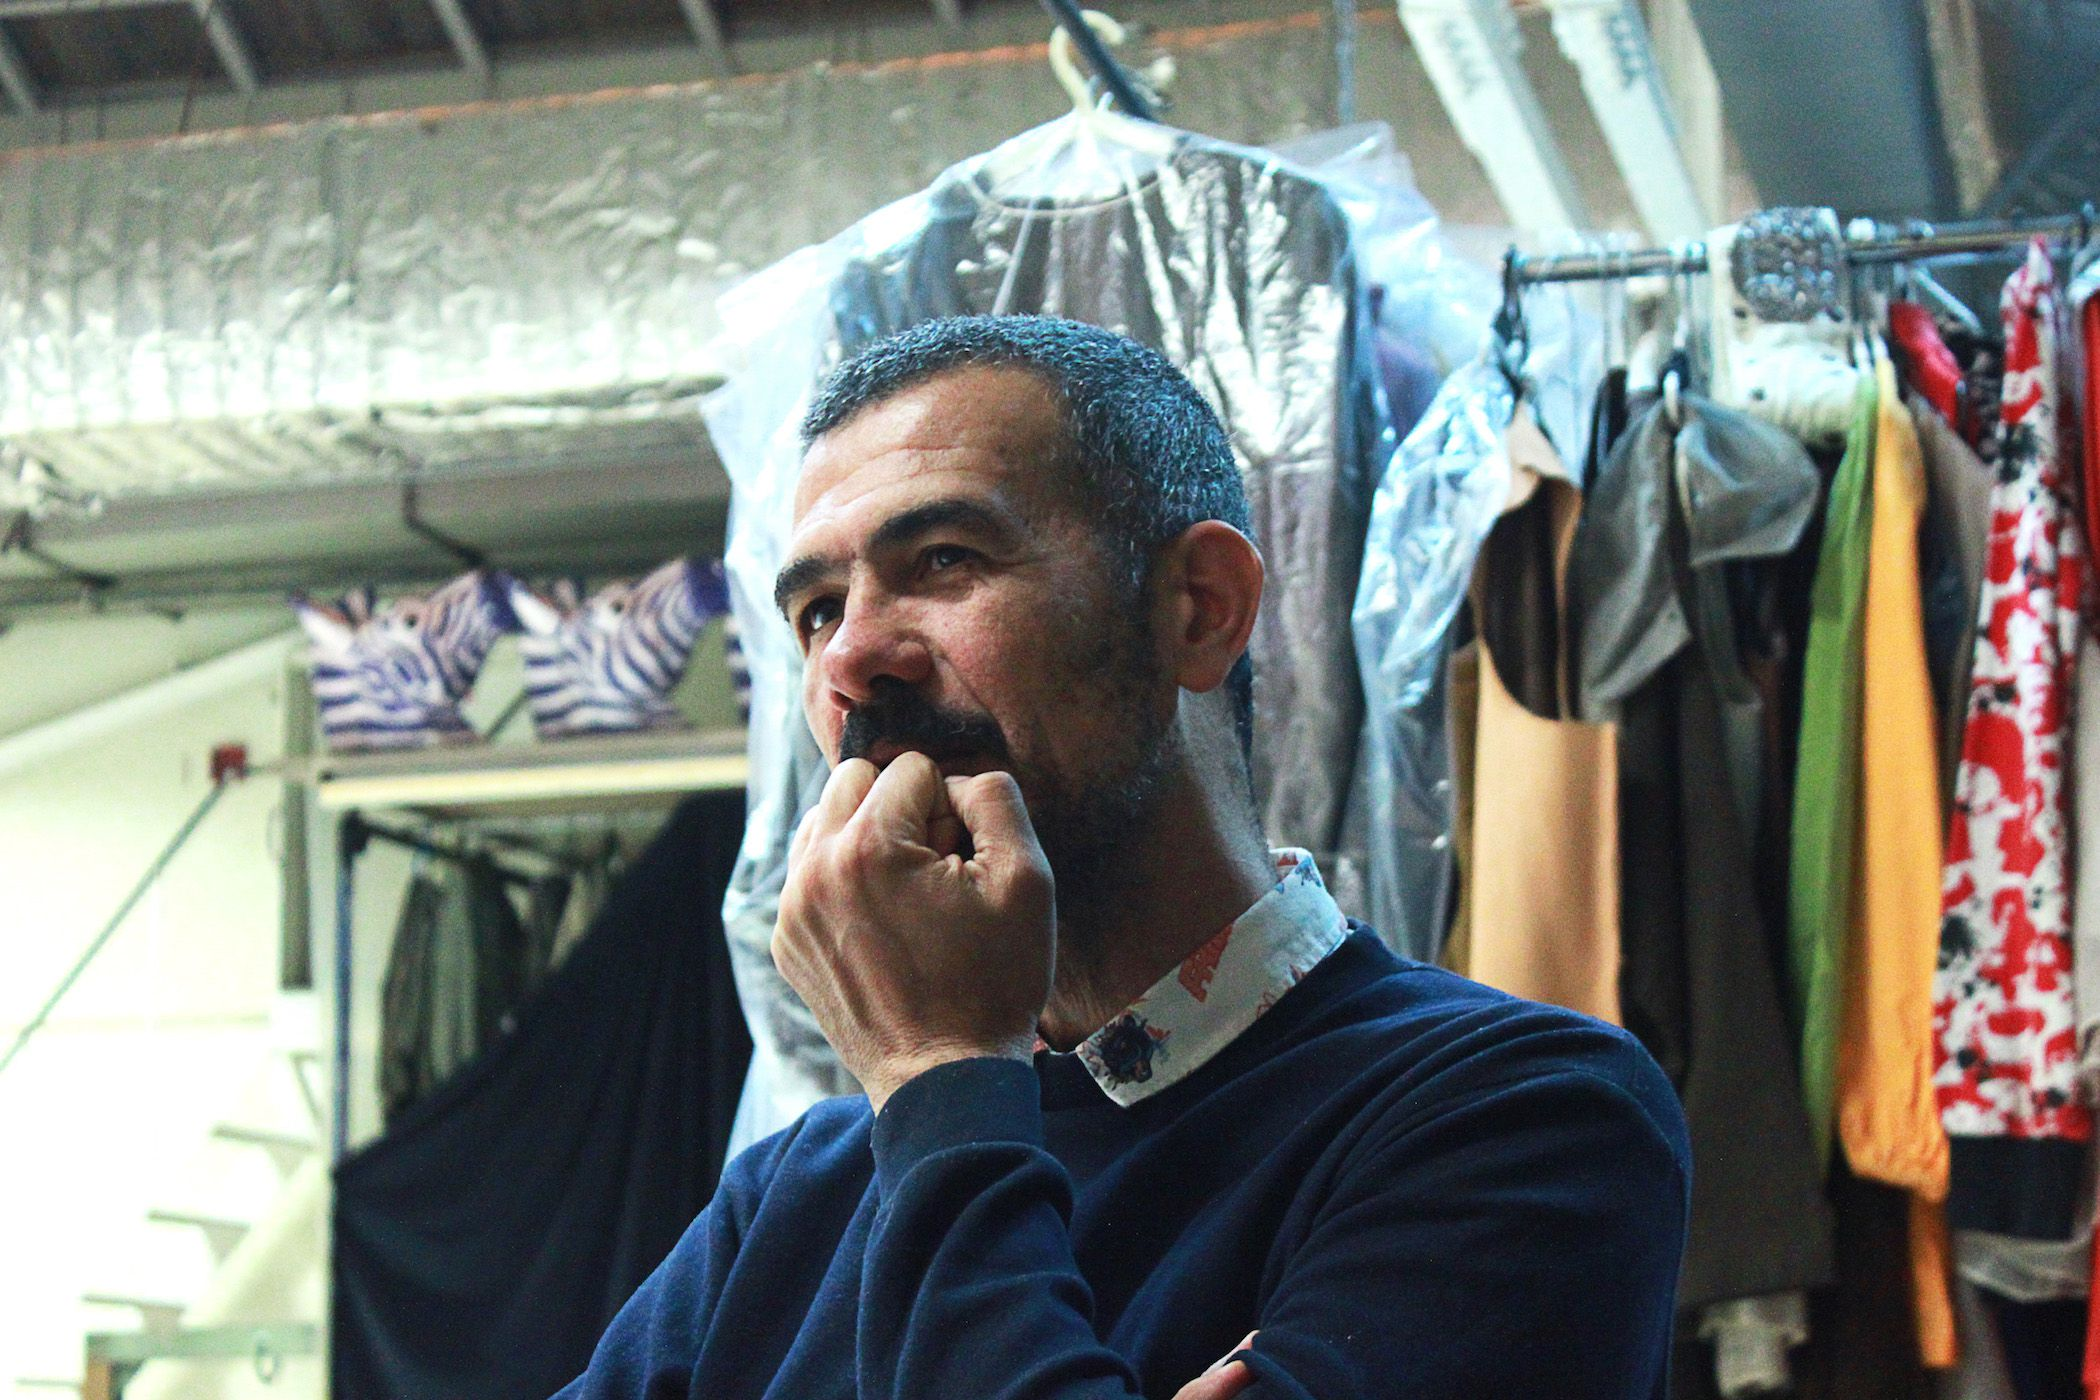 Entrevista: Gustavo Ciríaco e a desconstrução do Teatro Nacional D. Maria II